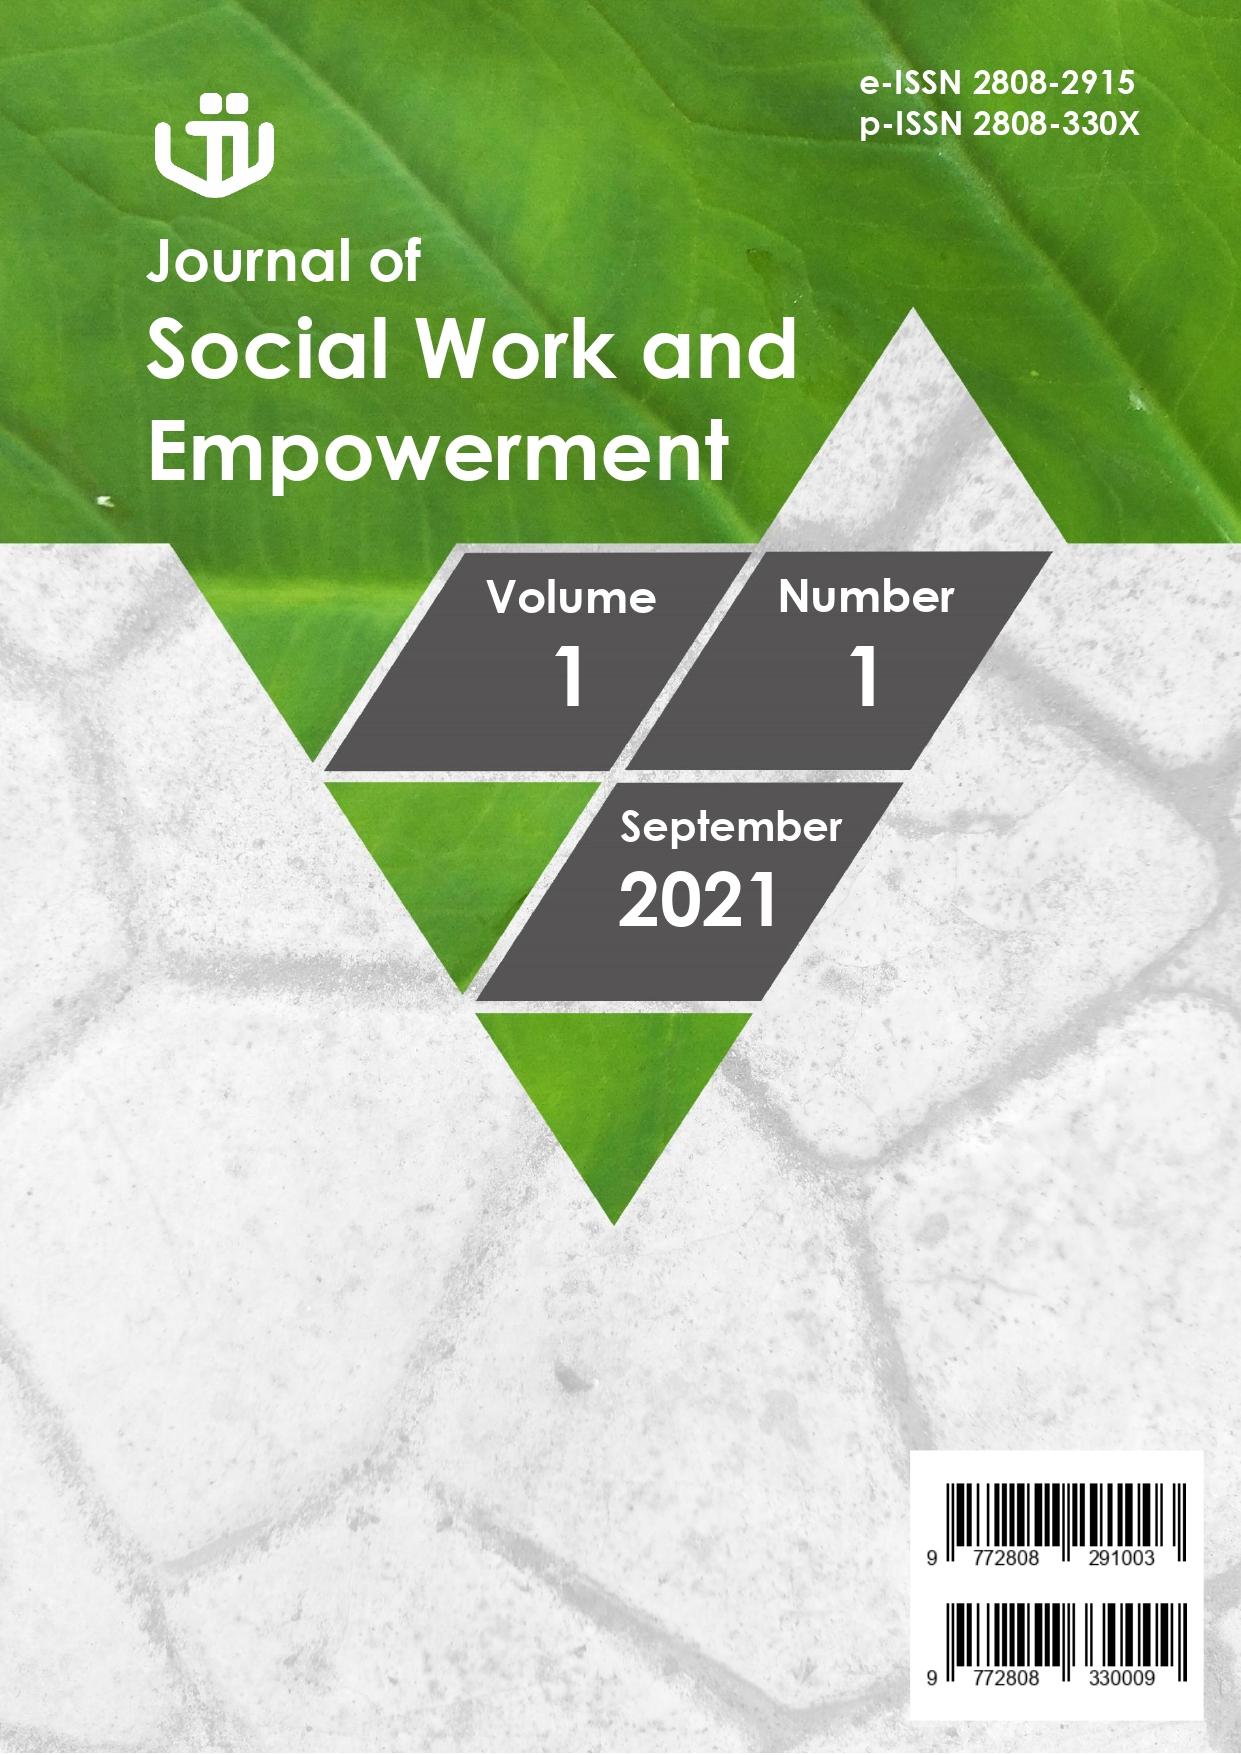 Lihat Vol 1 No 1 (2021): Journal of Social Work and Empowerment - September 2021